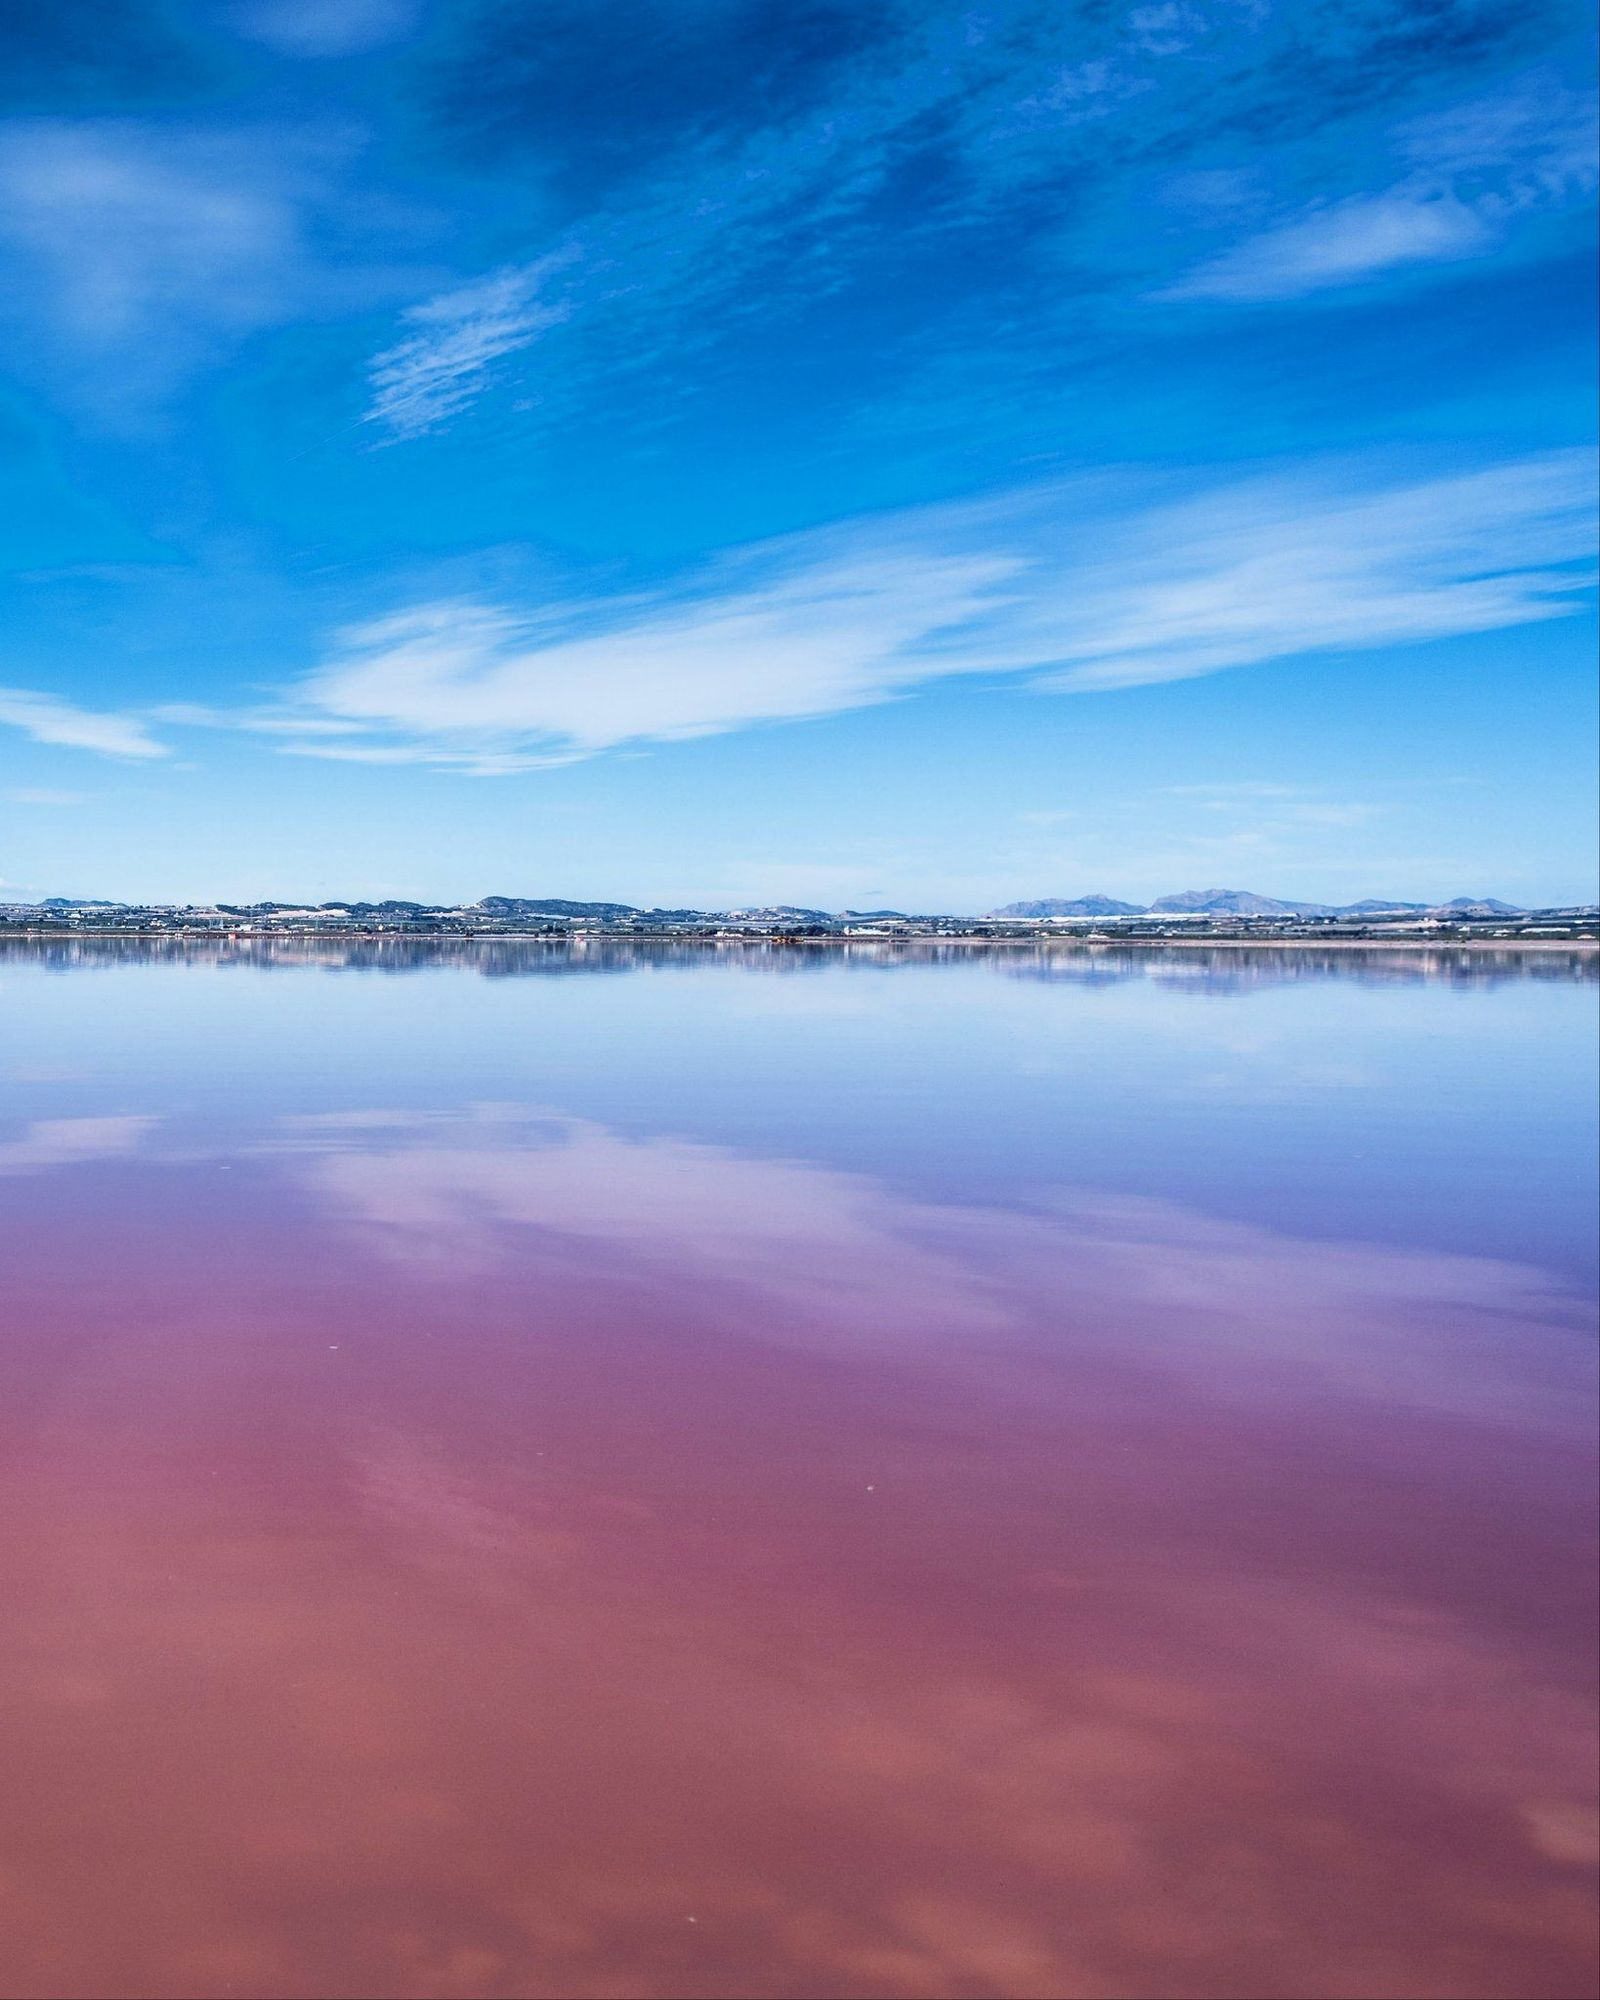 laguna-rosa-turismo.jpg